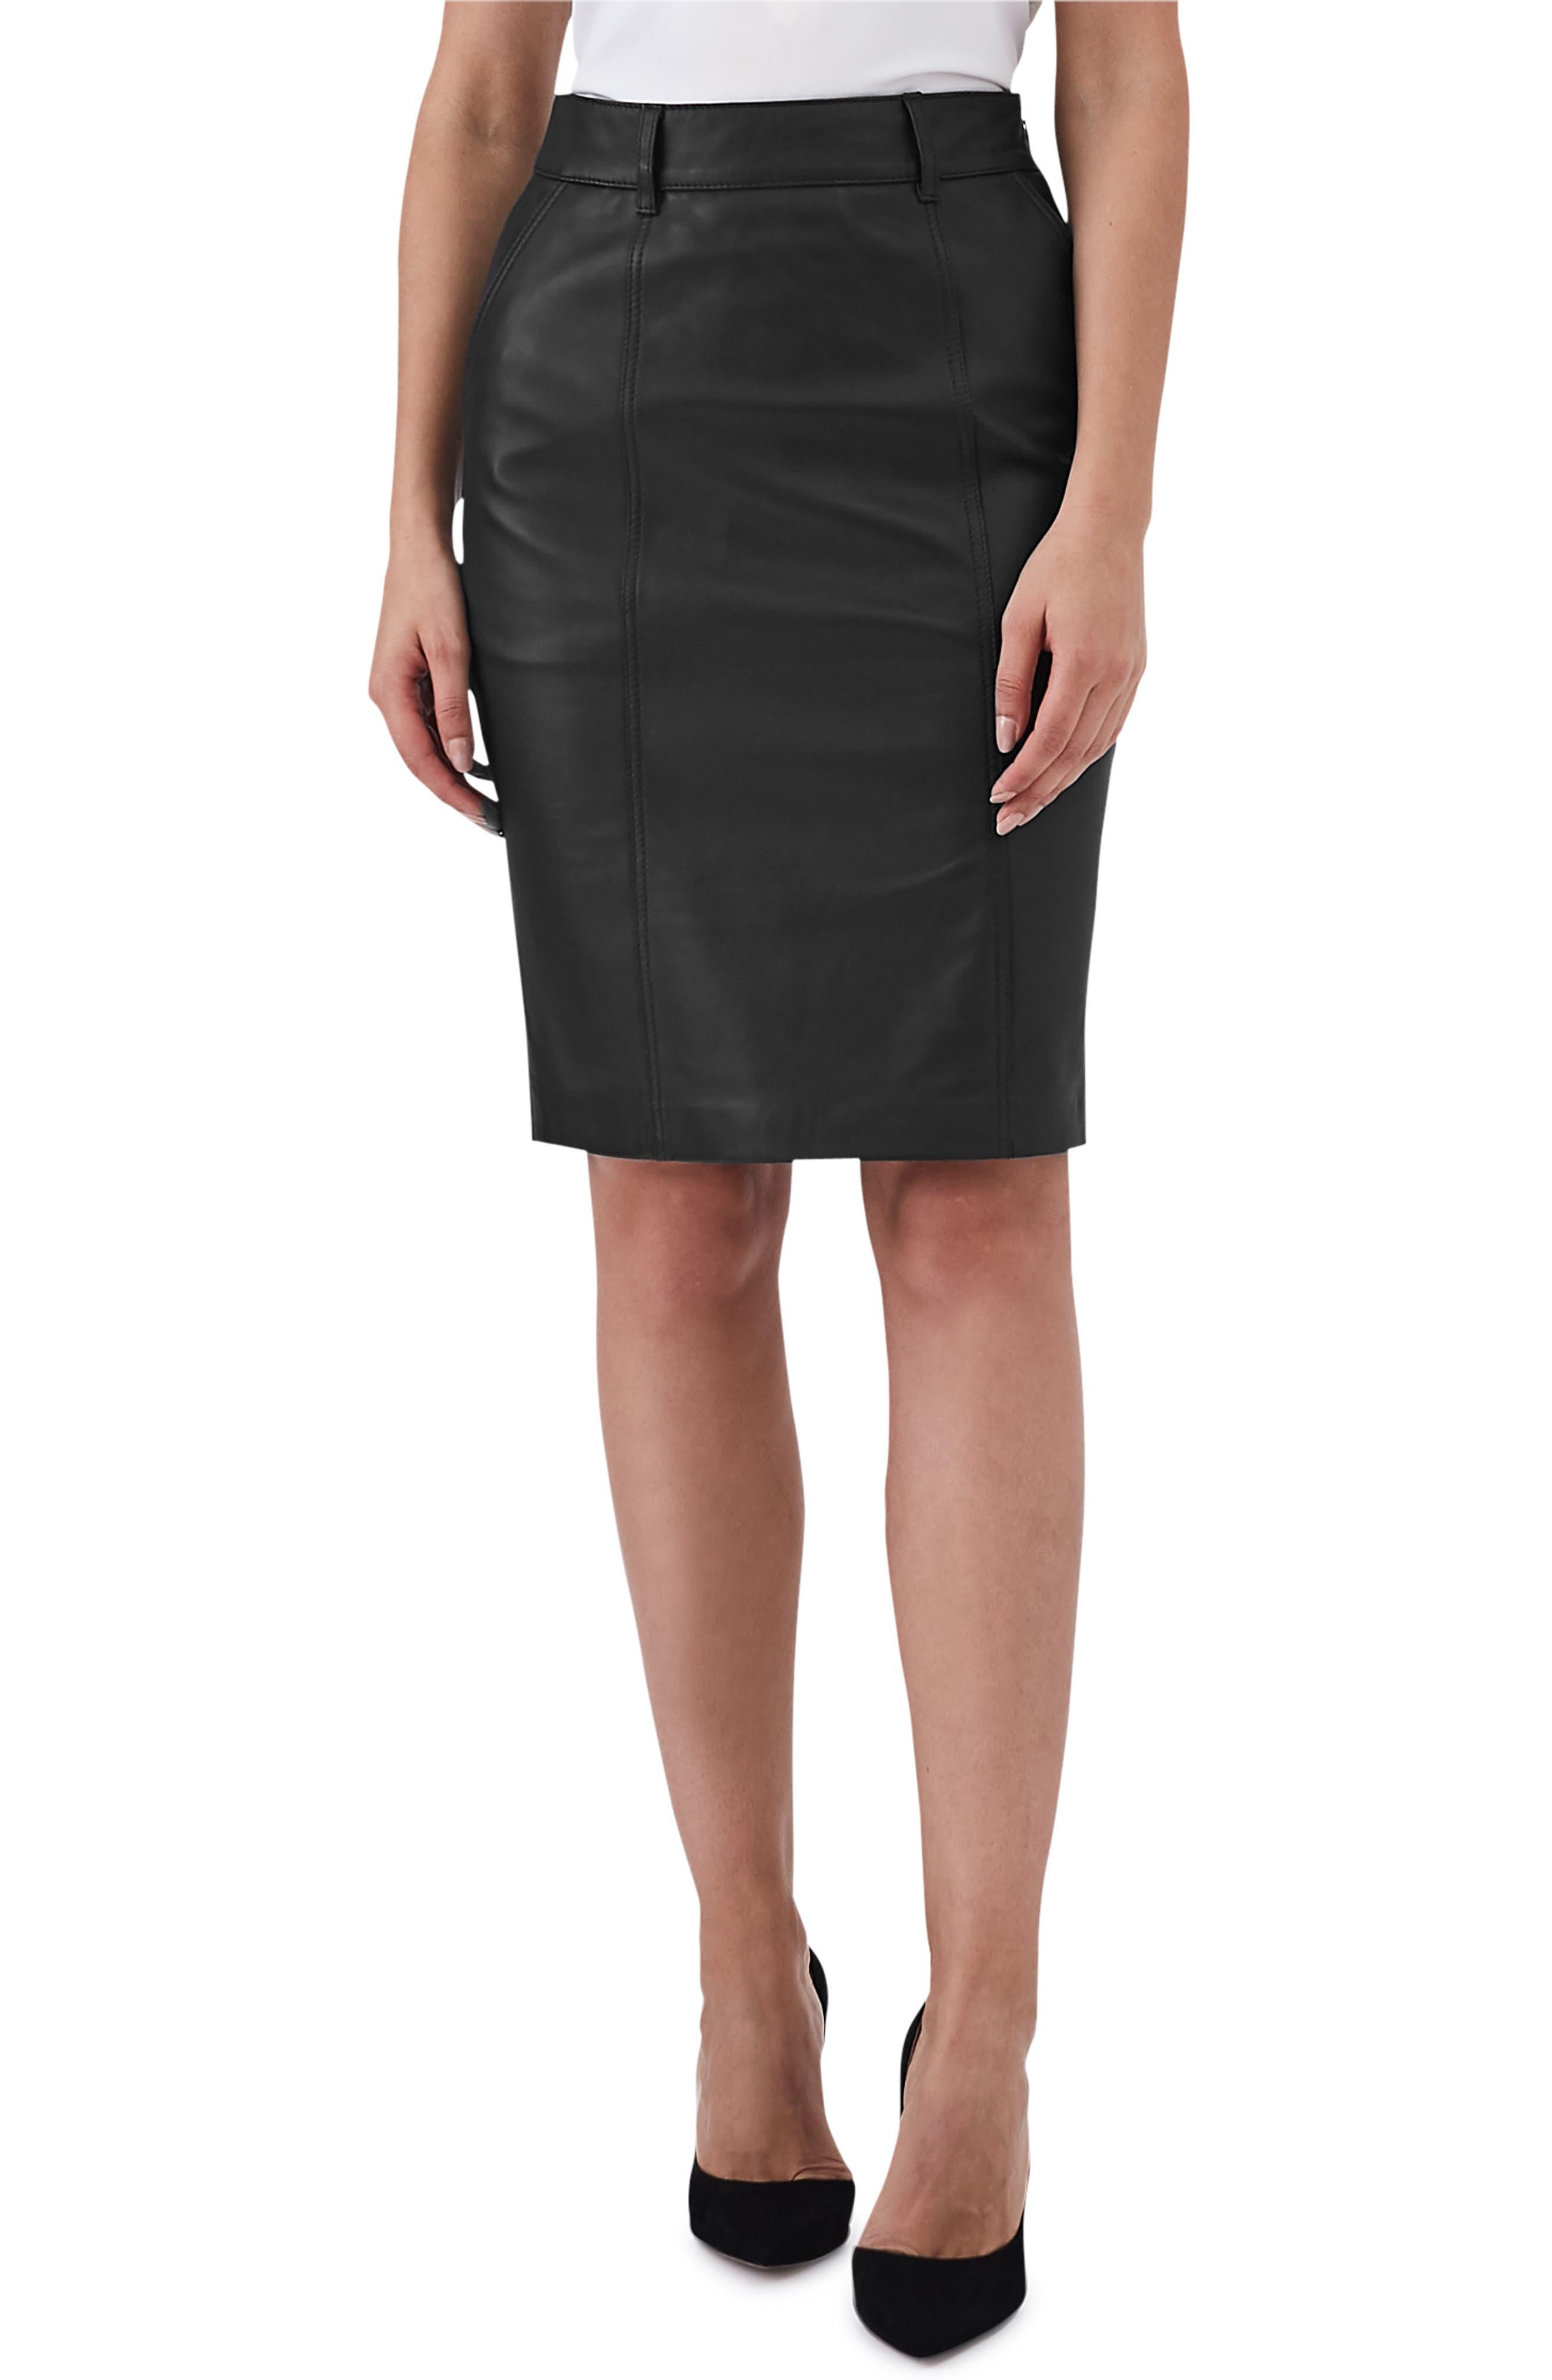 Kara Leather Pencil Skirt,                         Main,                         color, BLACK